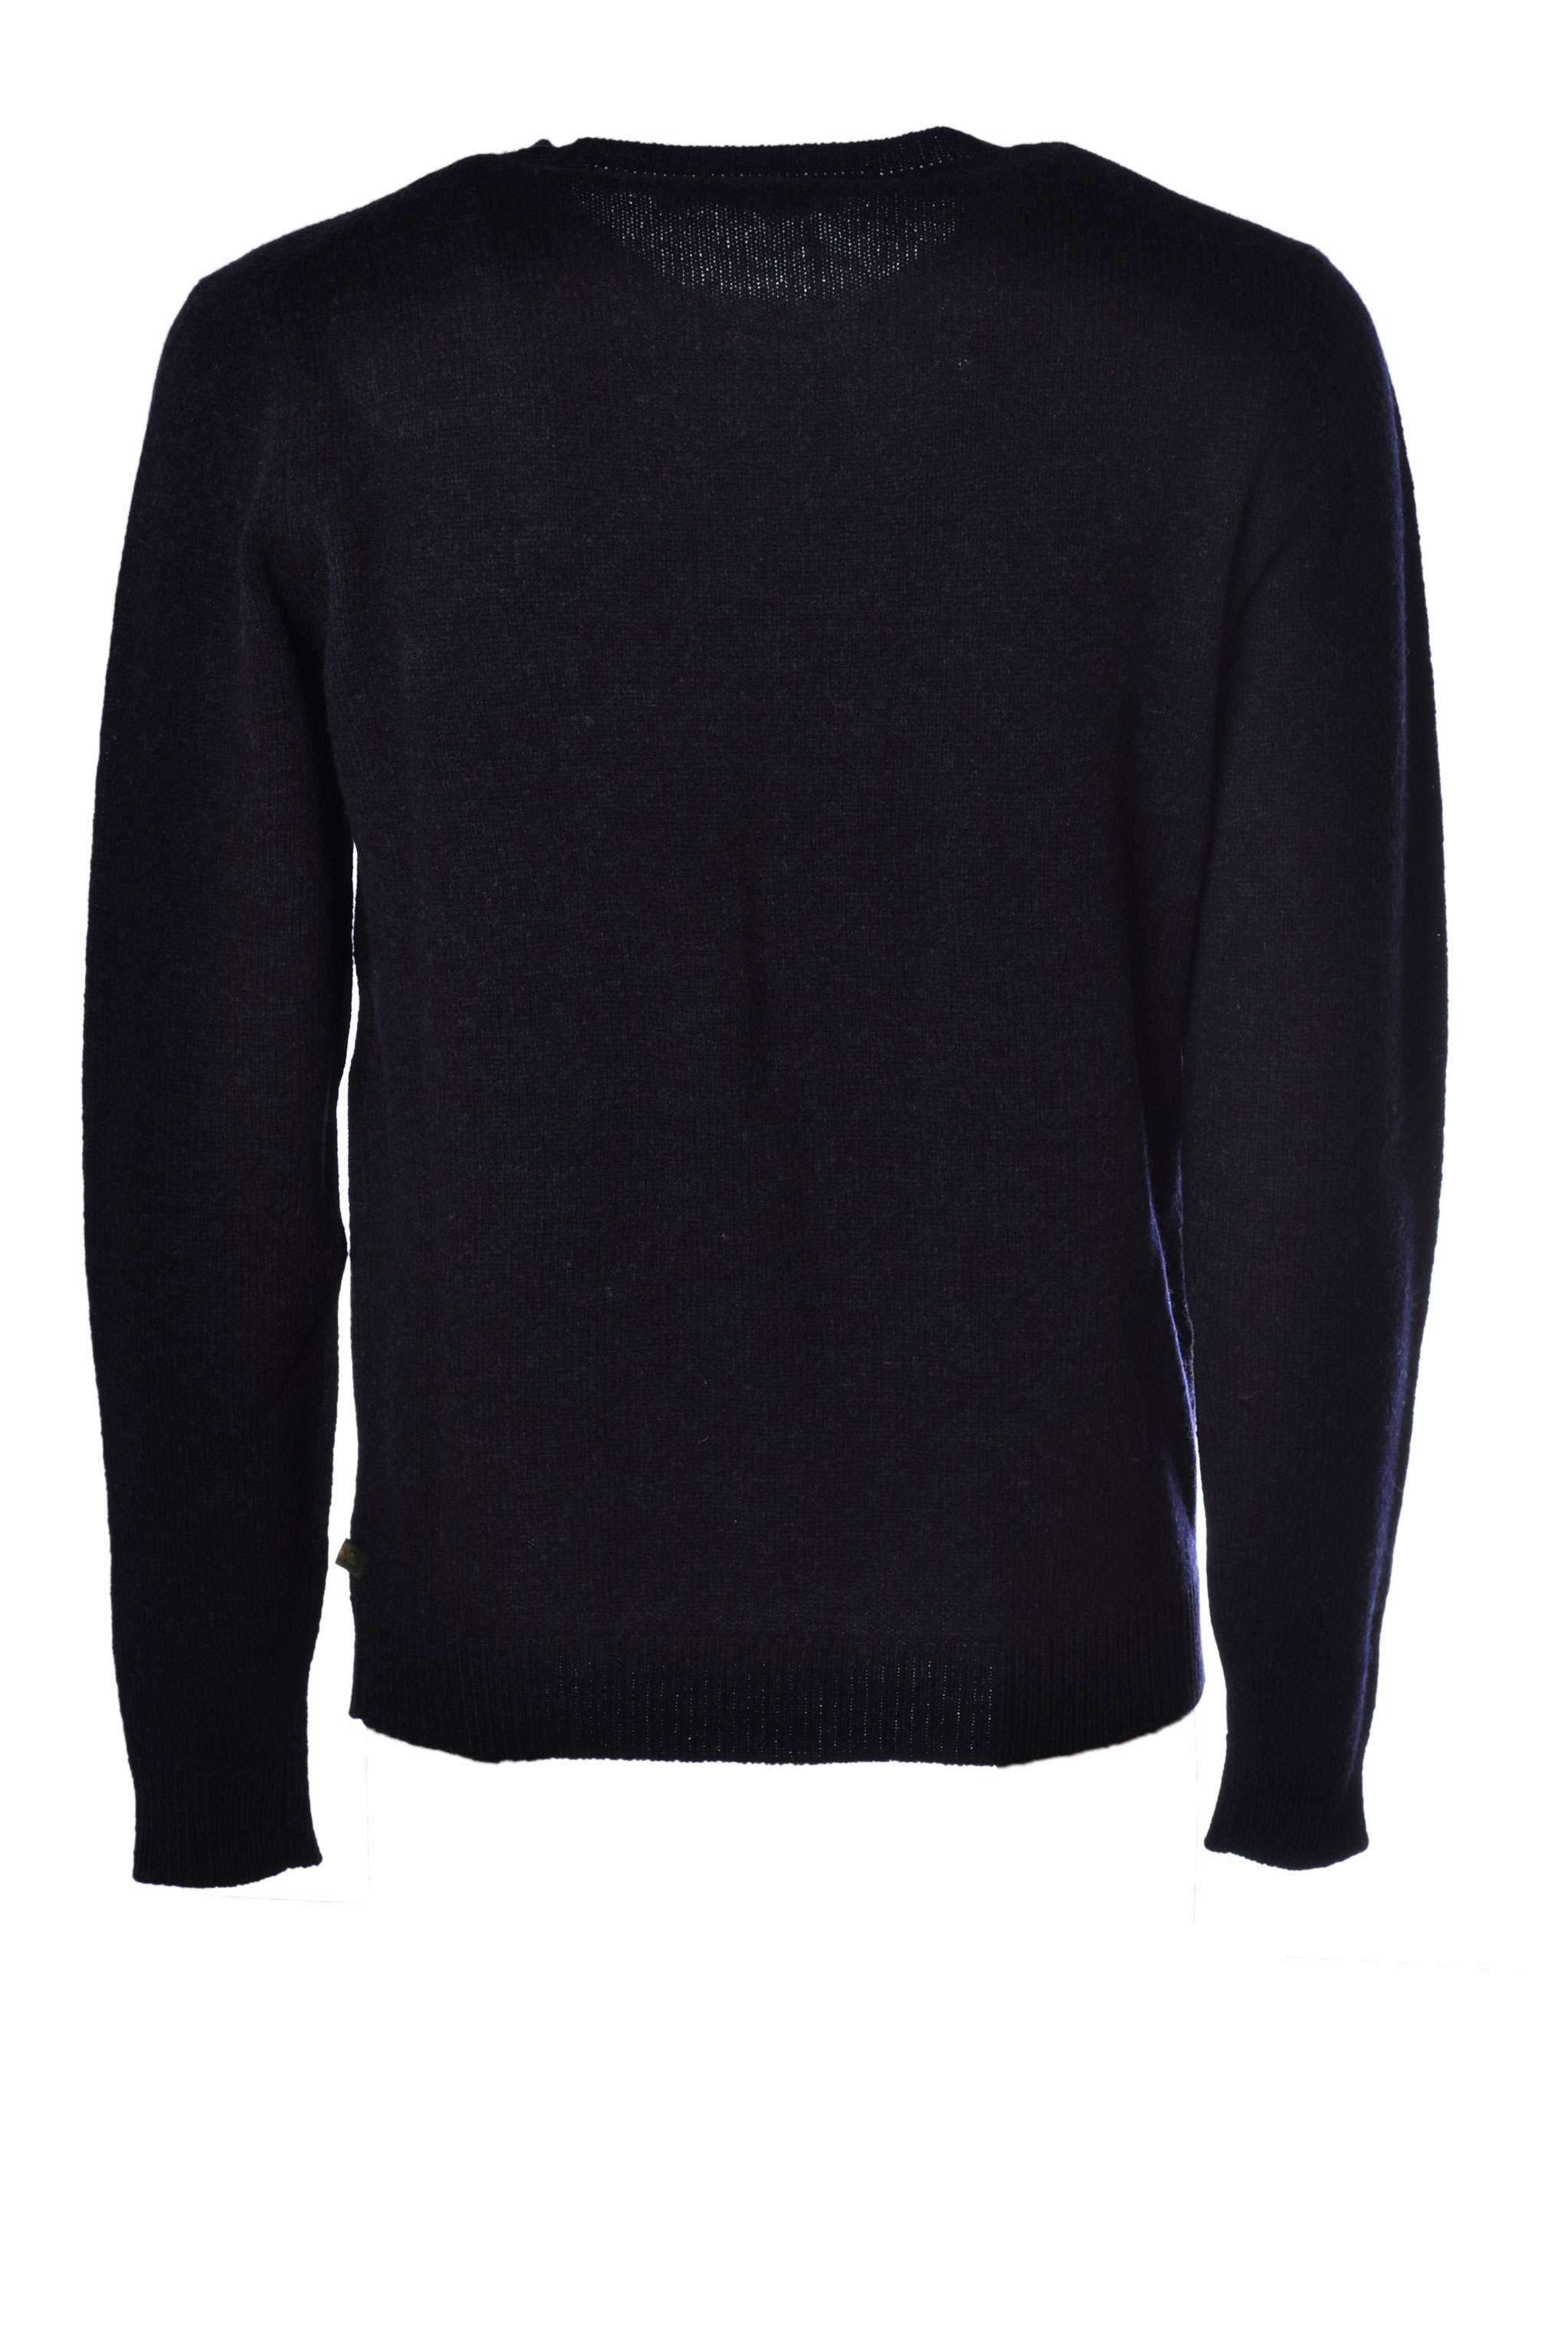 Irish Crone - Pullover